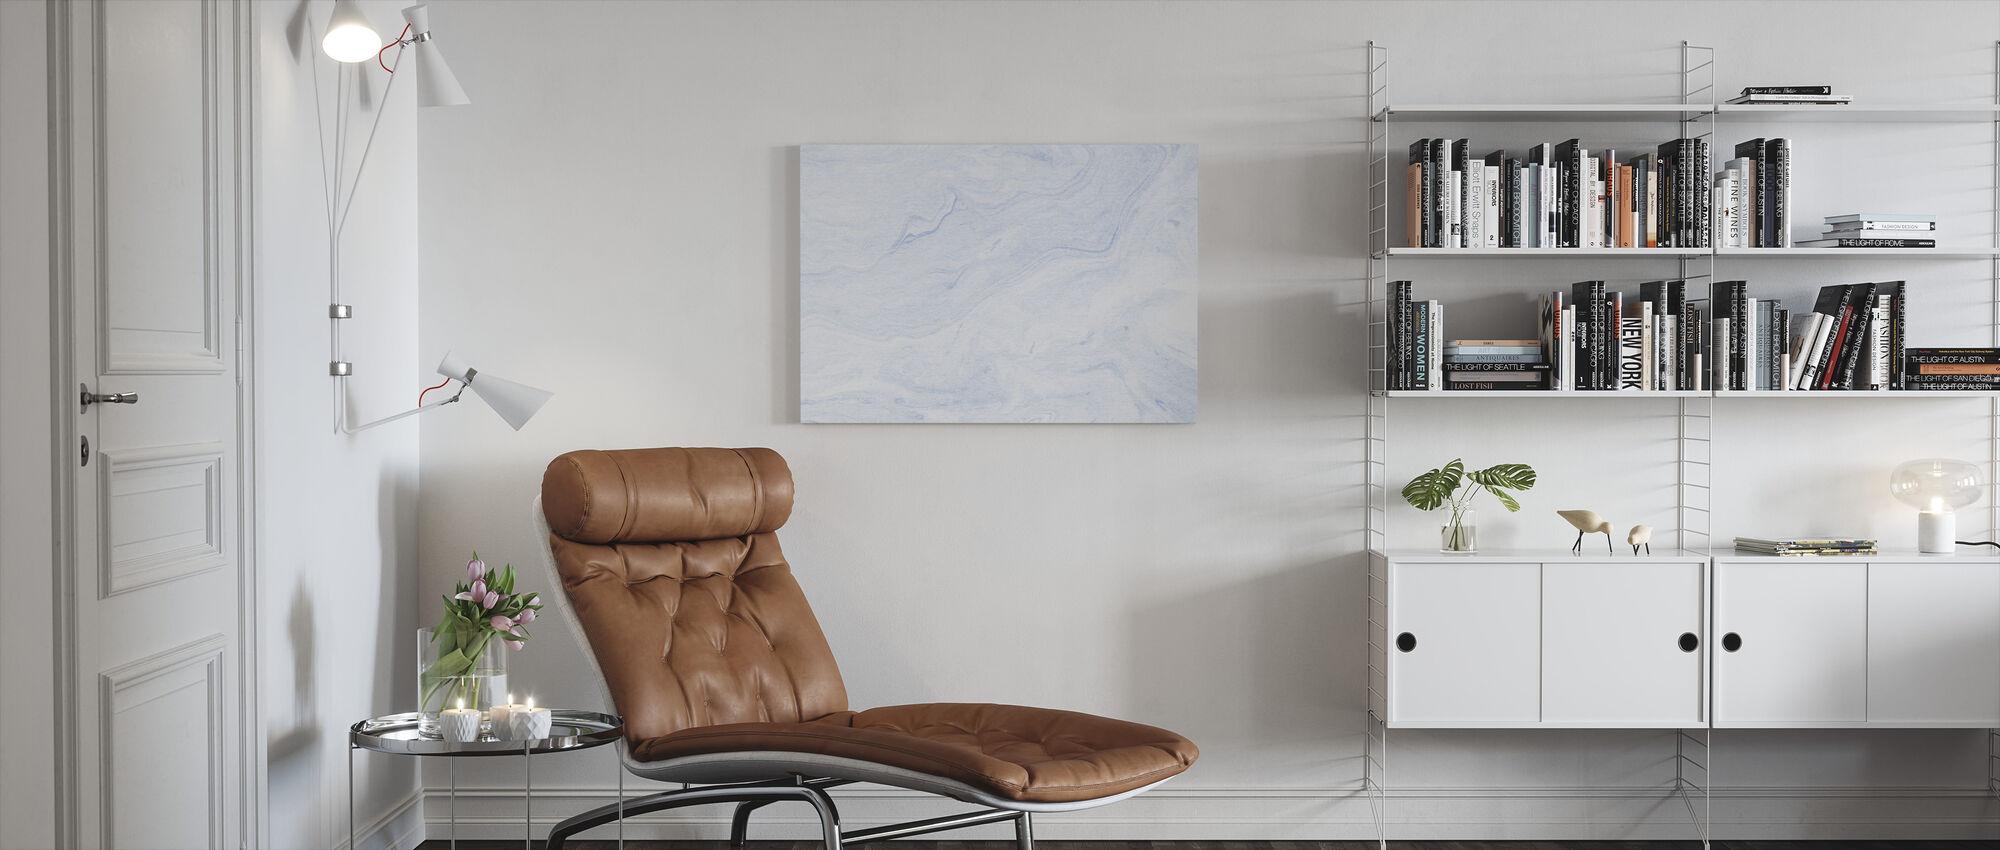 Suminagashi Marbling - Kiiro - Canvas print - Living Room